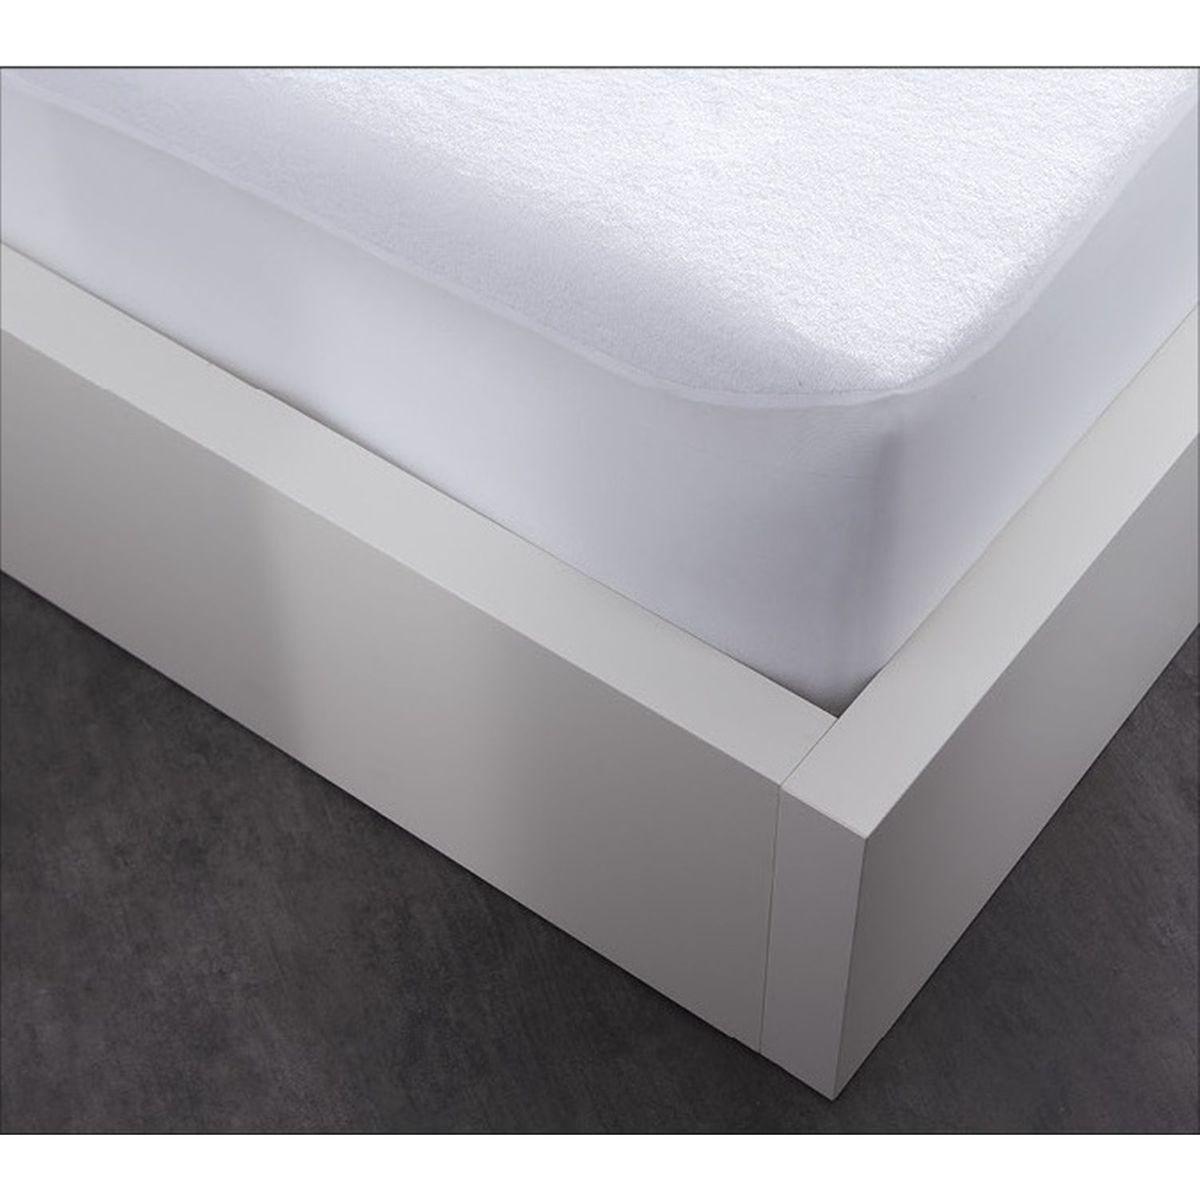 Protège matelas Alèse en coton By Night - 90 x 190 cm